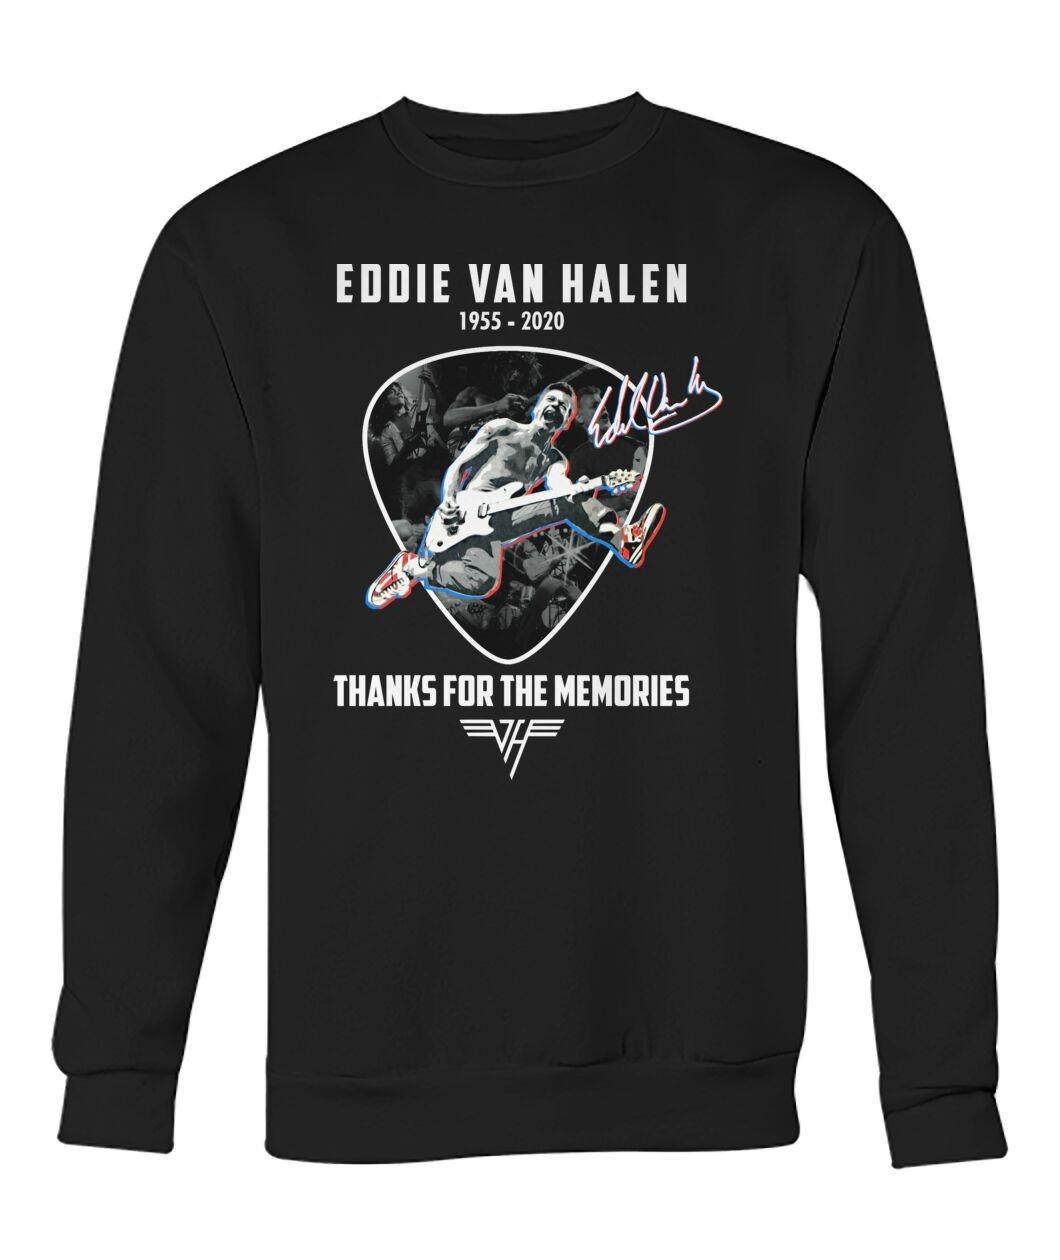 Eddie Van Halen Shirt 1955 2020 Thank You The Memories